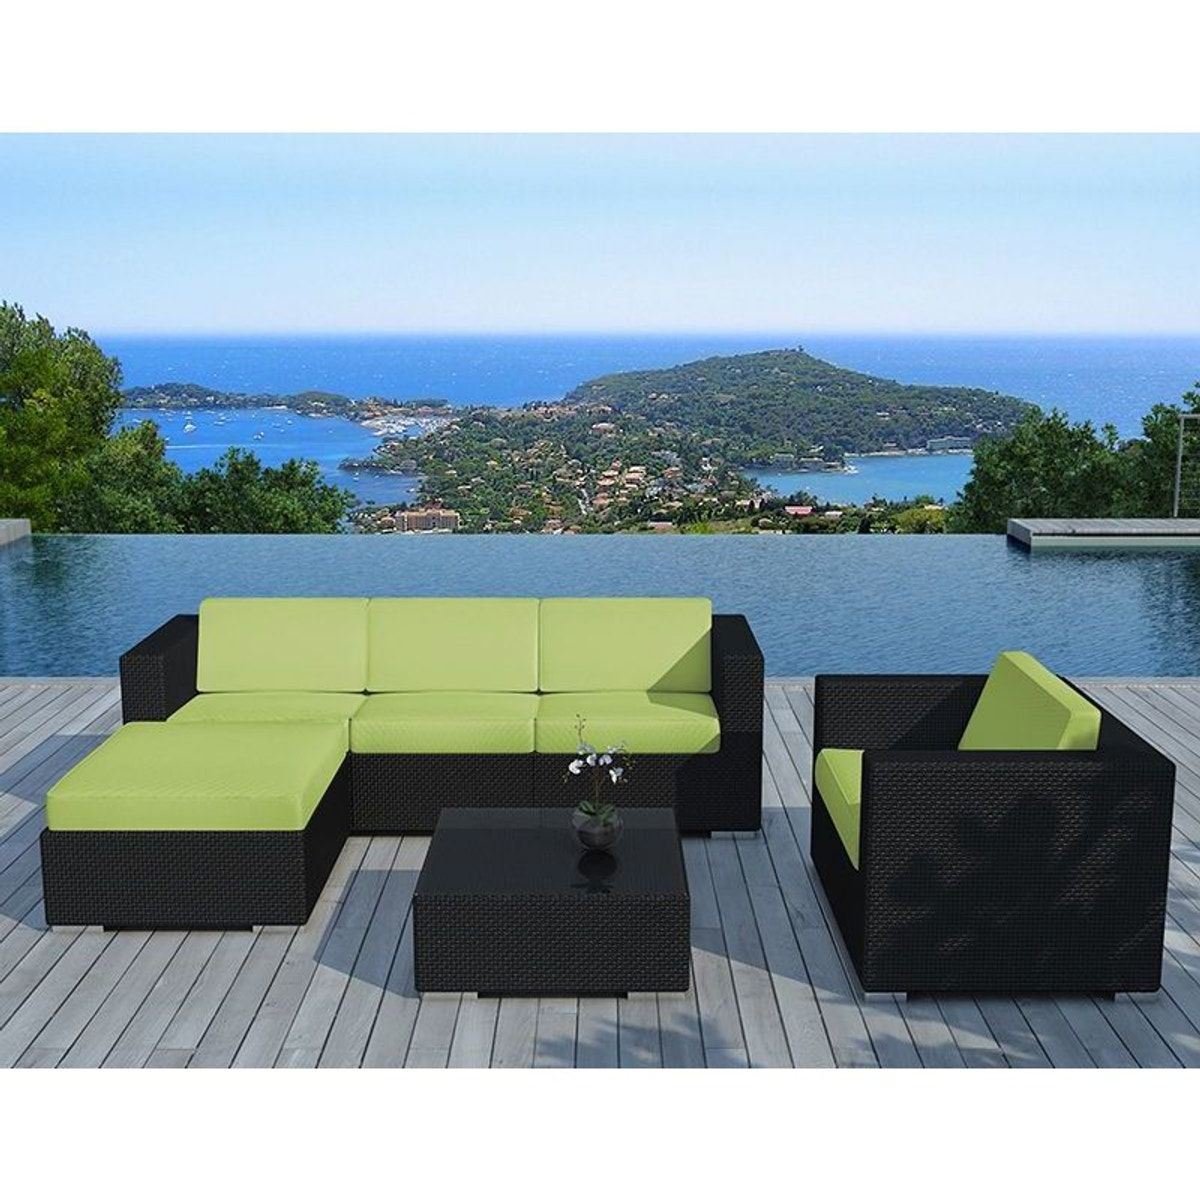 Stunning Salon De Jardin En Resine Tressee Vert Anis Photos ...